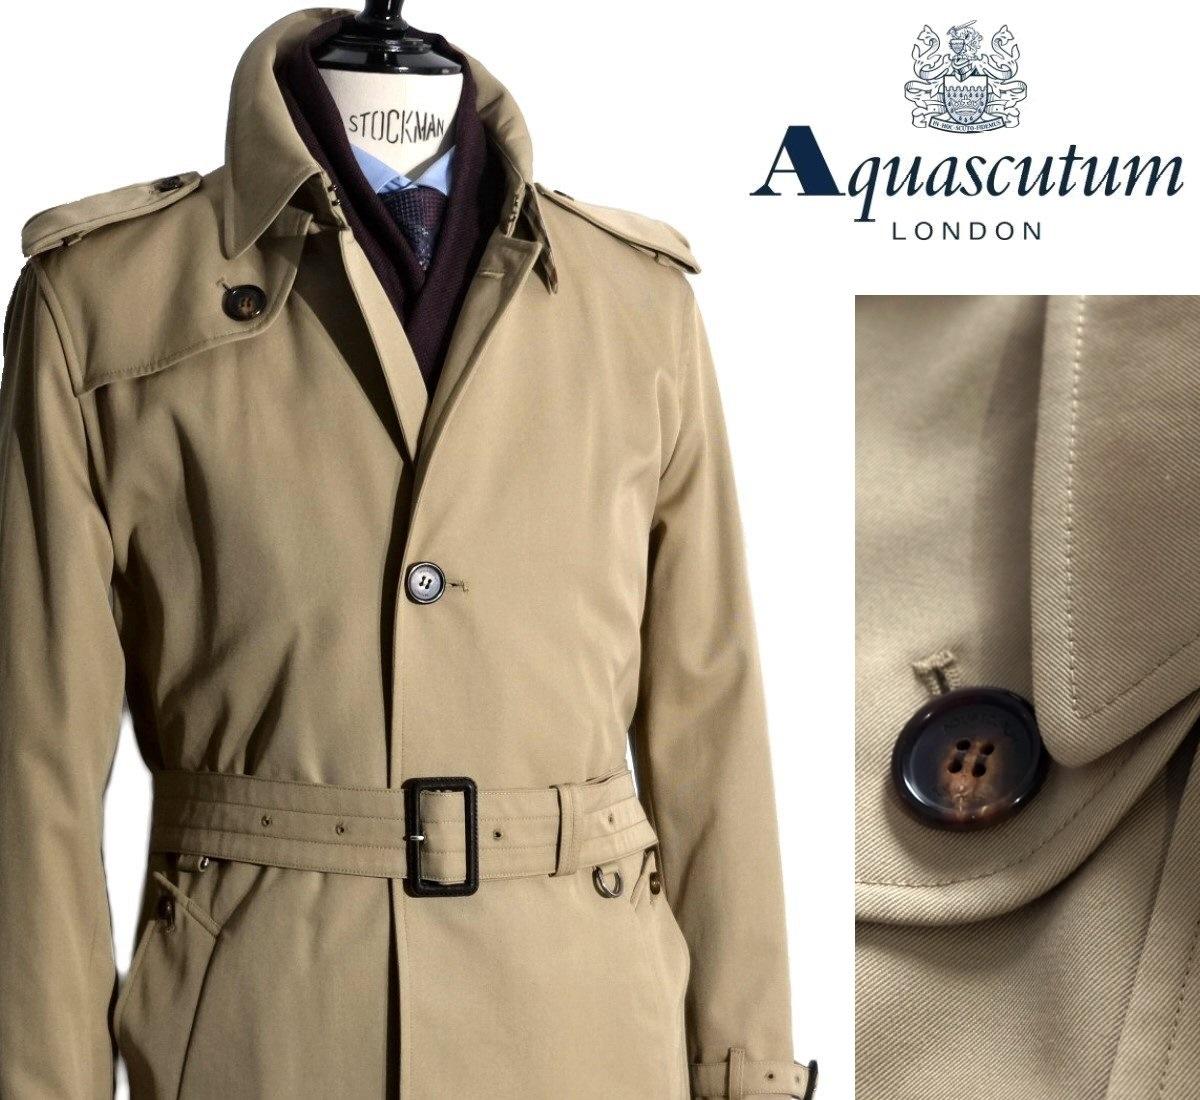 Aquascutum【アクアスキュータム】定価176,000円(税込)◆30%OFF◆英国製シングルベルテッドコート撥水加工 ベージュ